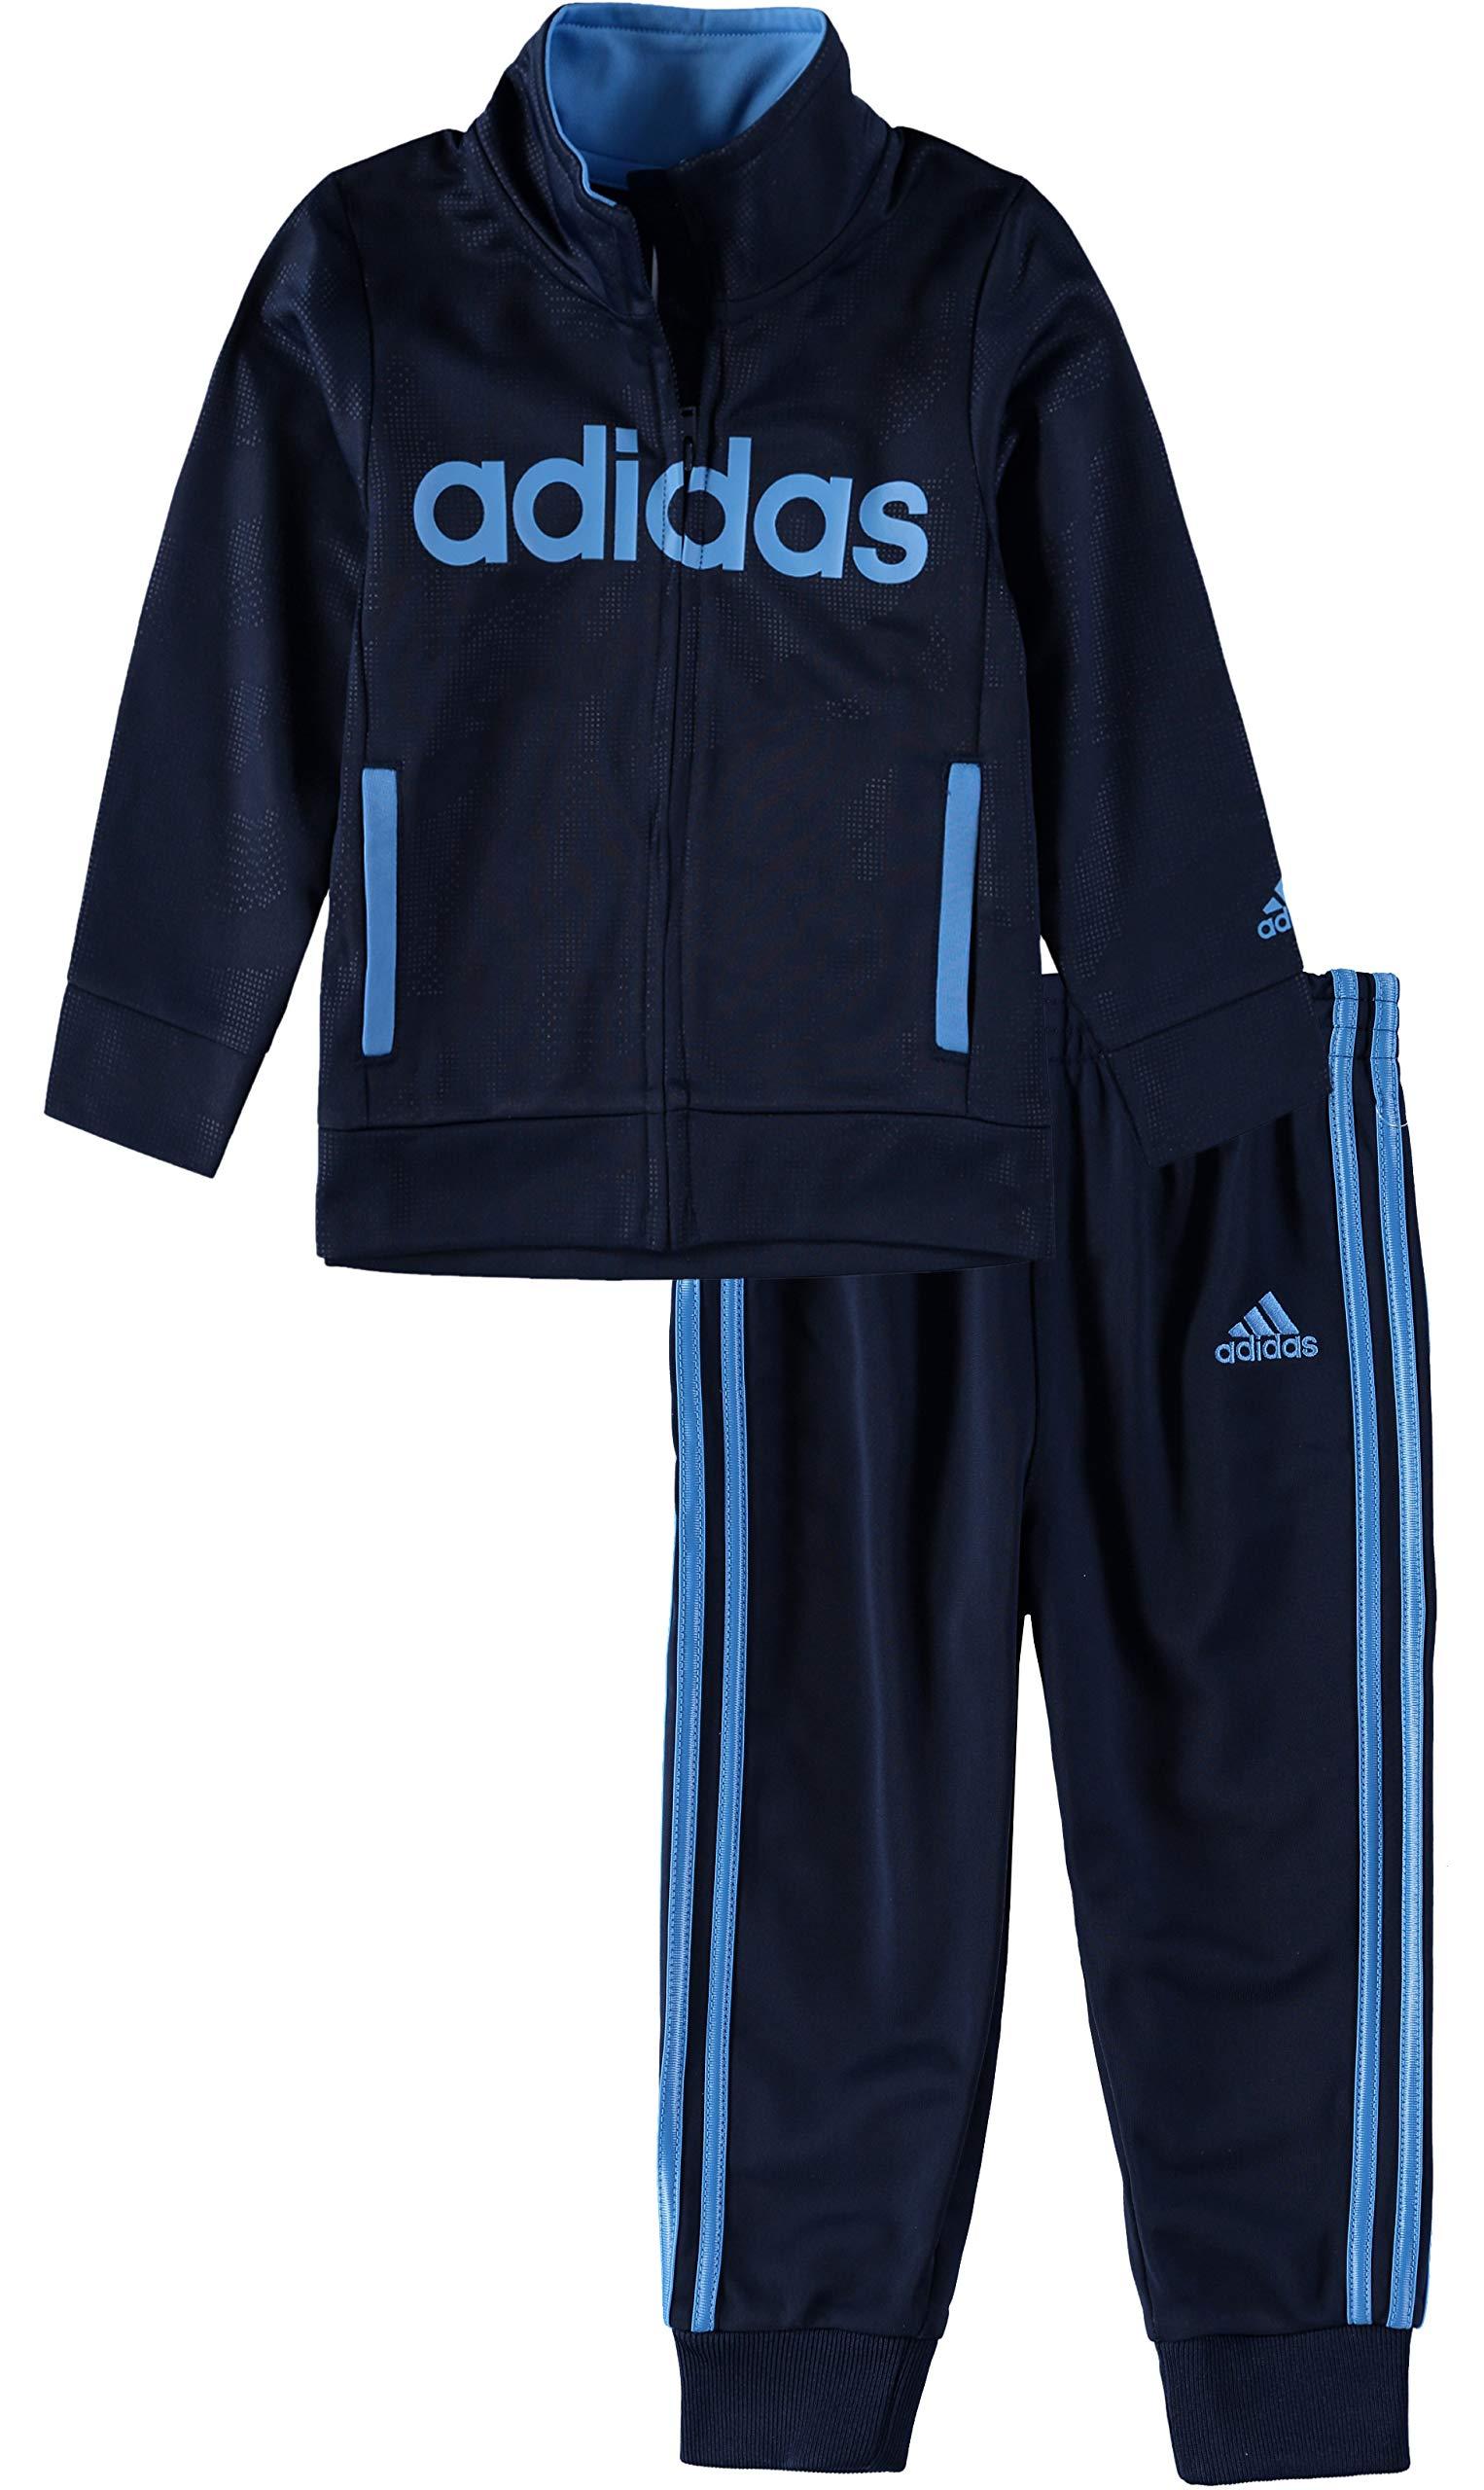 adidas Boys' Tricot Jacket and Pant Set (Navy/Light Blue, 4)